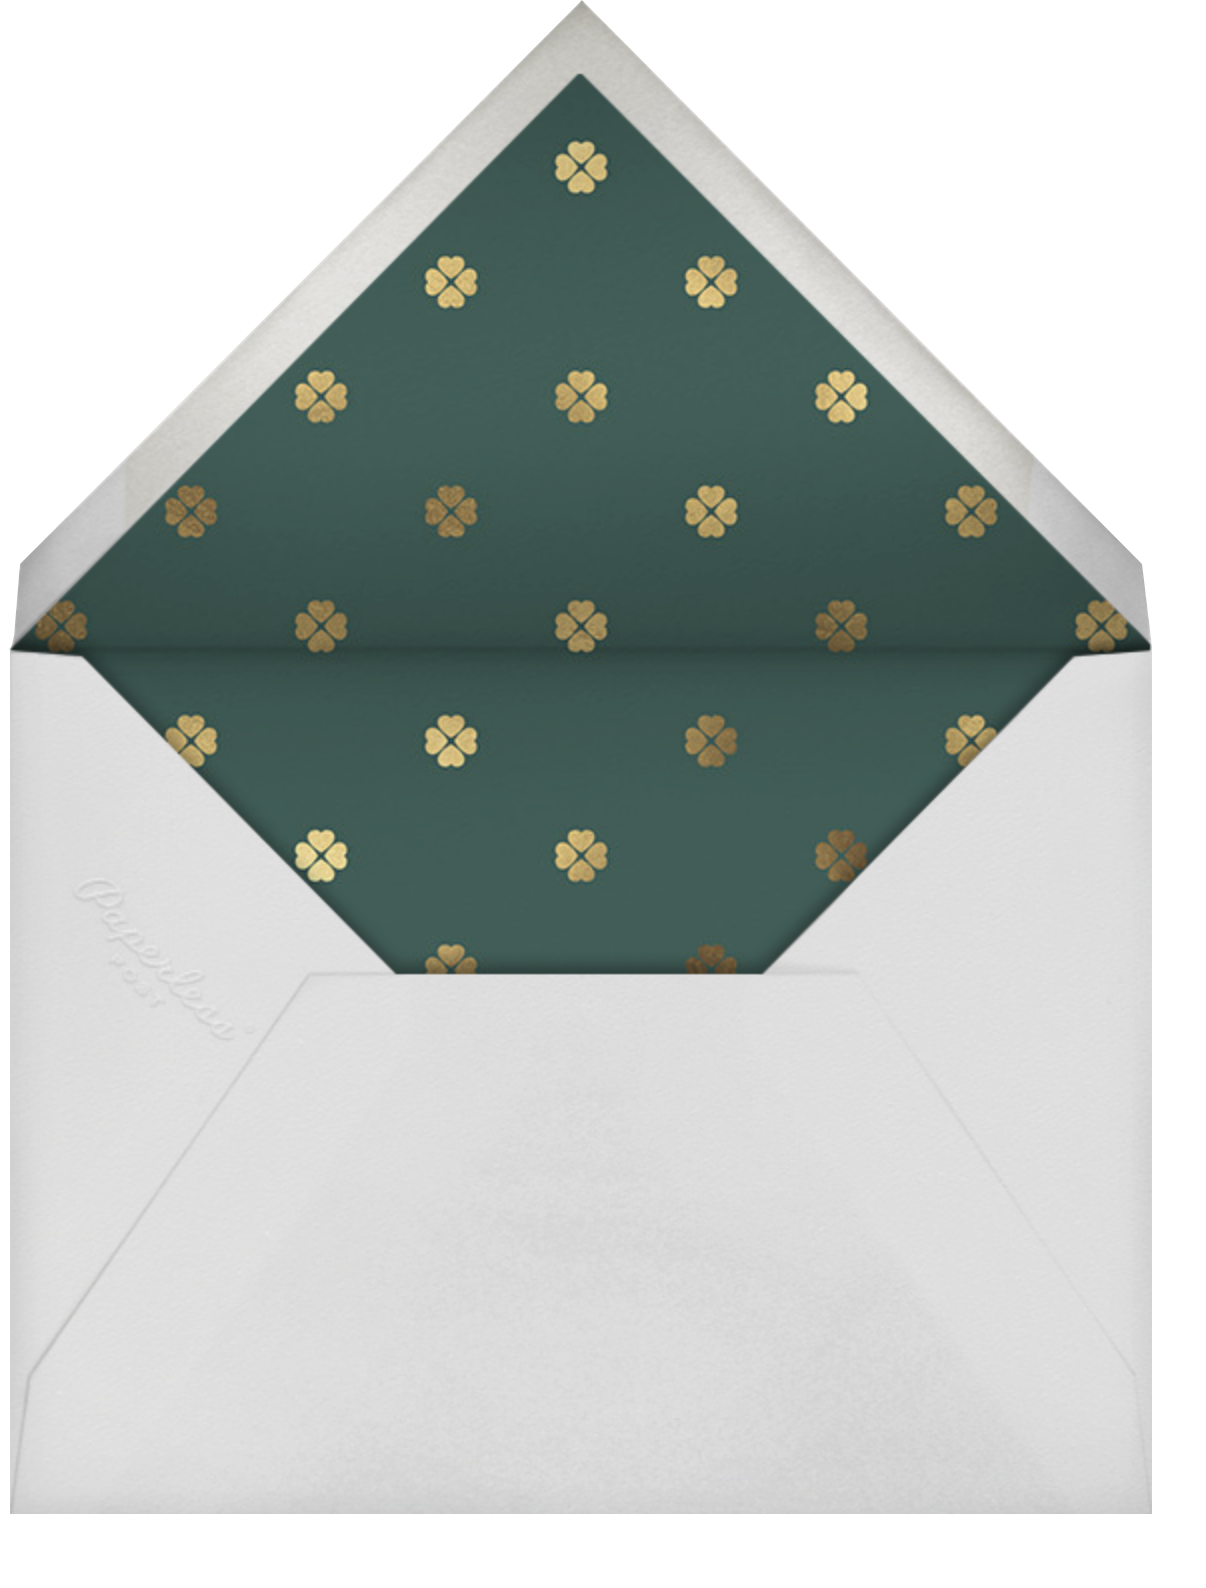 Colorblocked Stripes - Spruce/Carnation - kate spade new york - General entertaining - envelope back